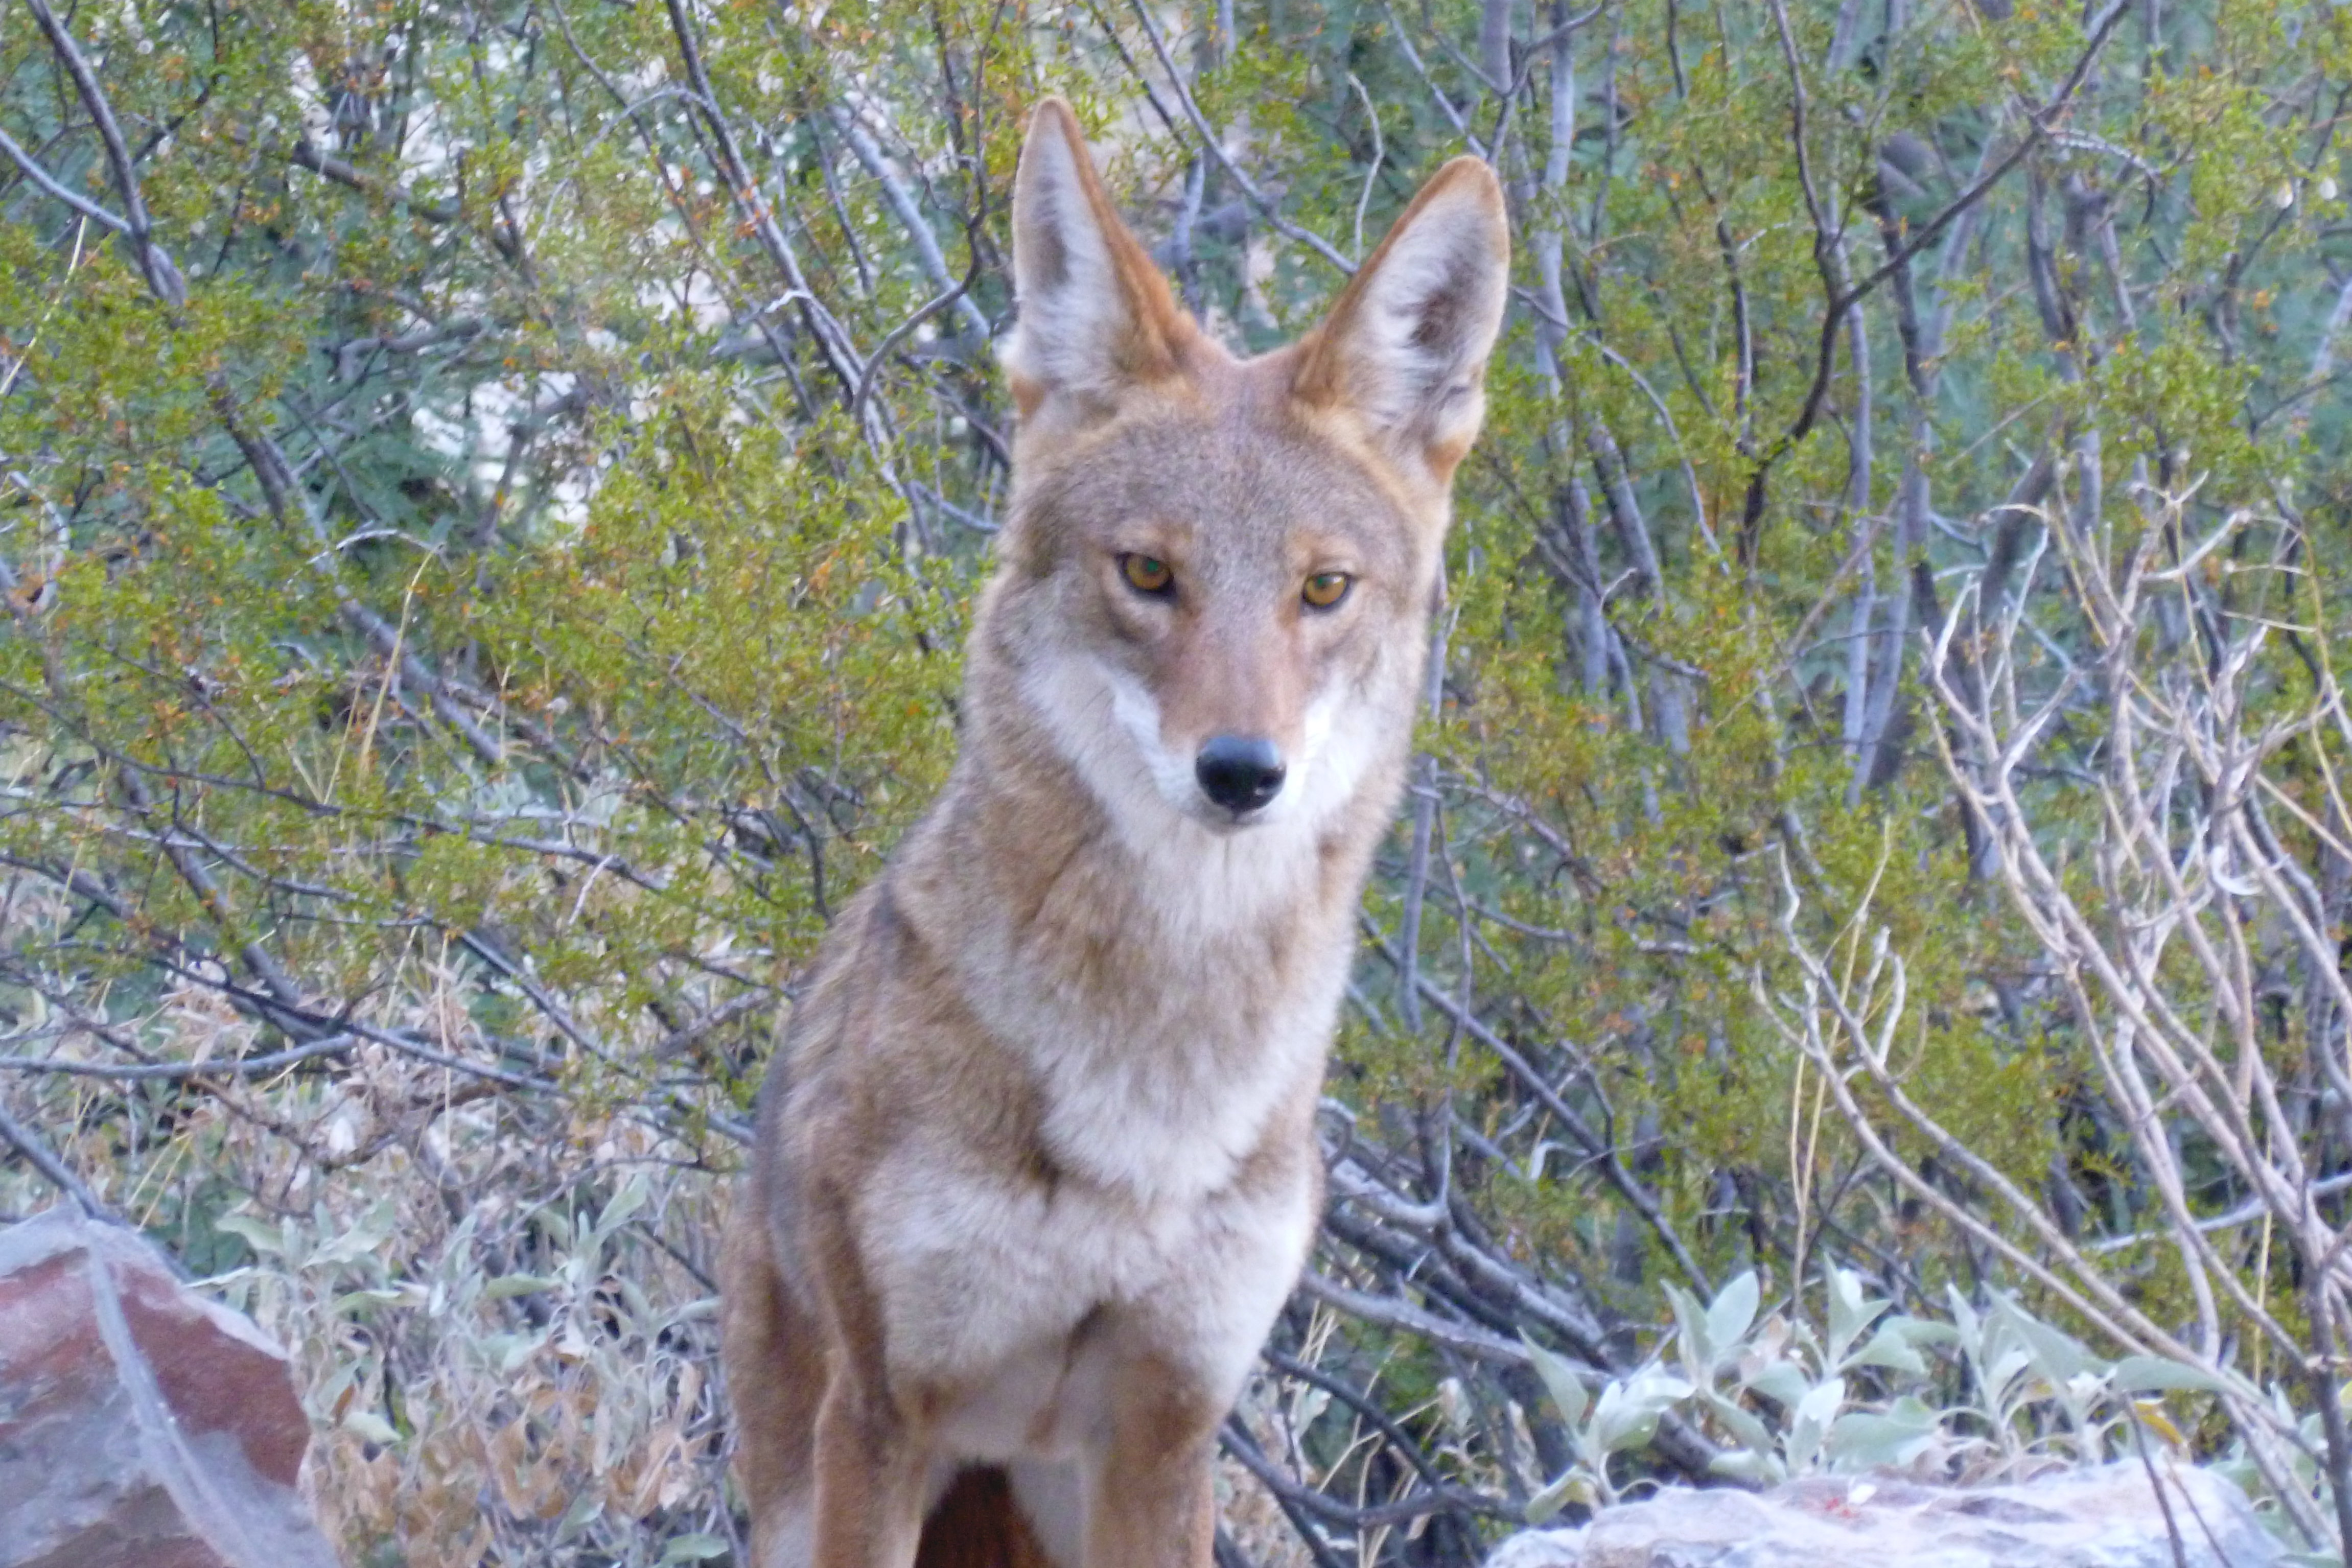 Desert coyote pictures - photo#23